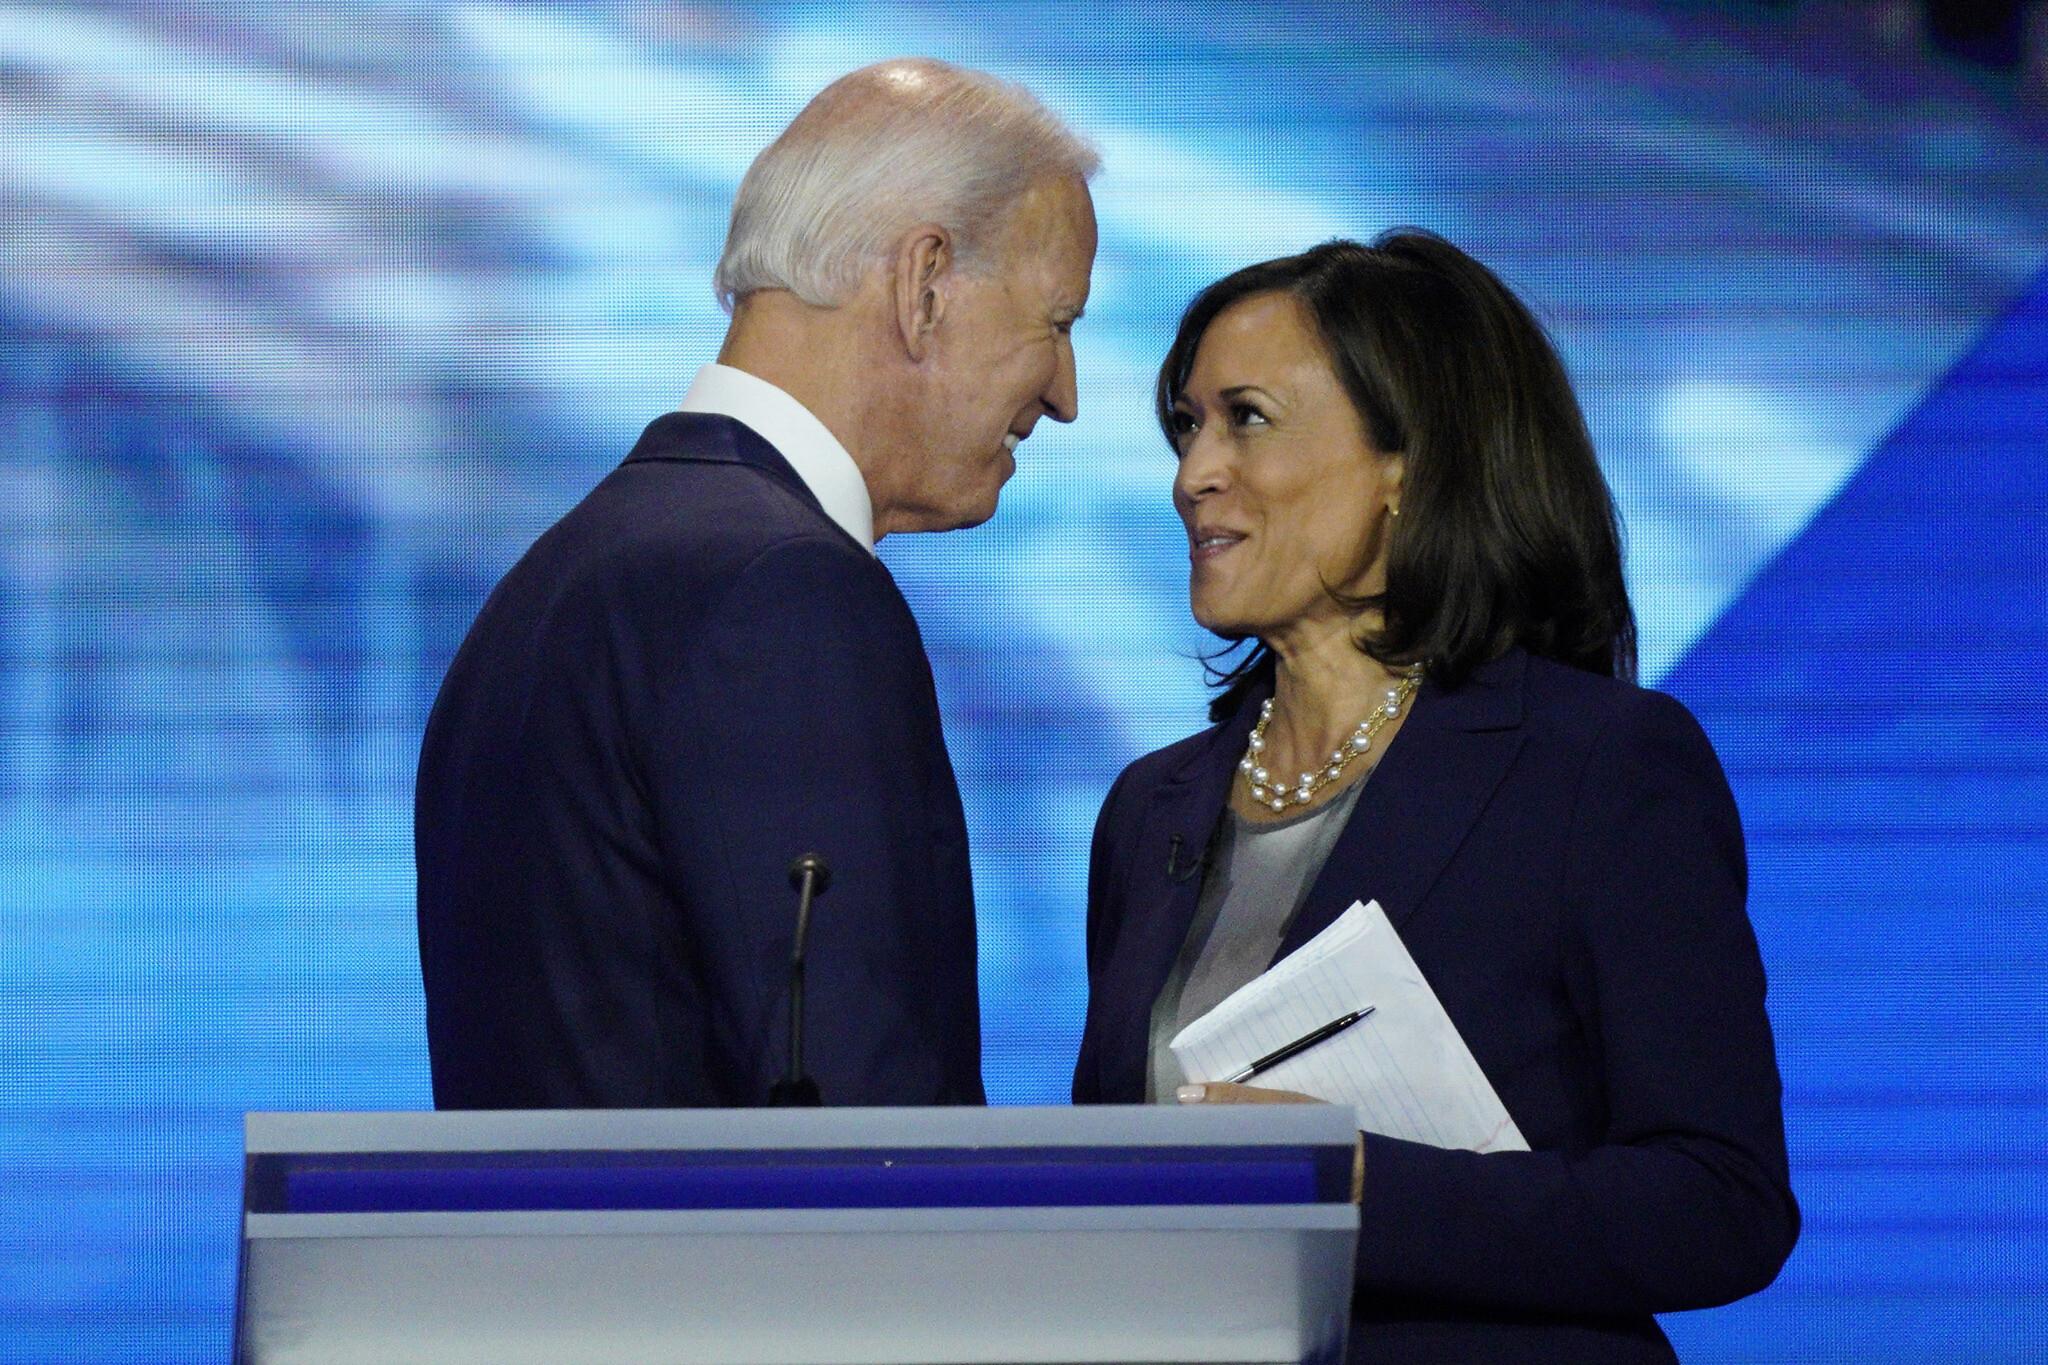 Joe Biden Selects Senator Kamala Harris As His Running Mate In 2020 Election The Times Of Israel